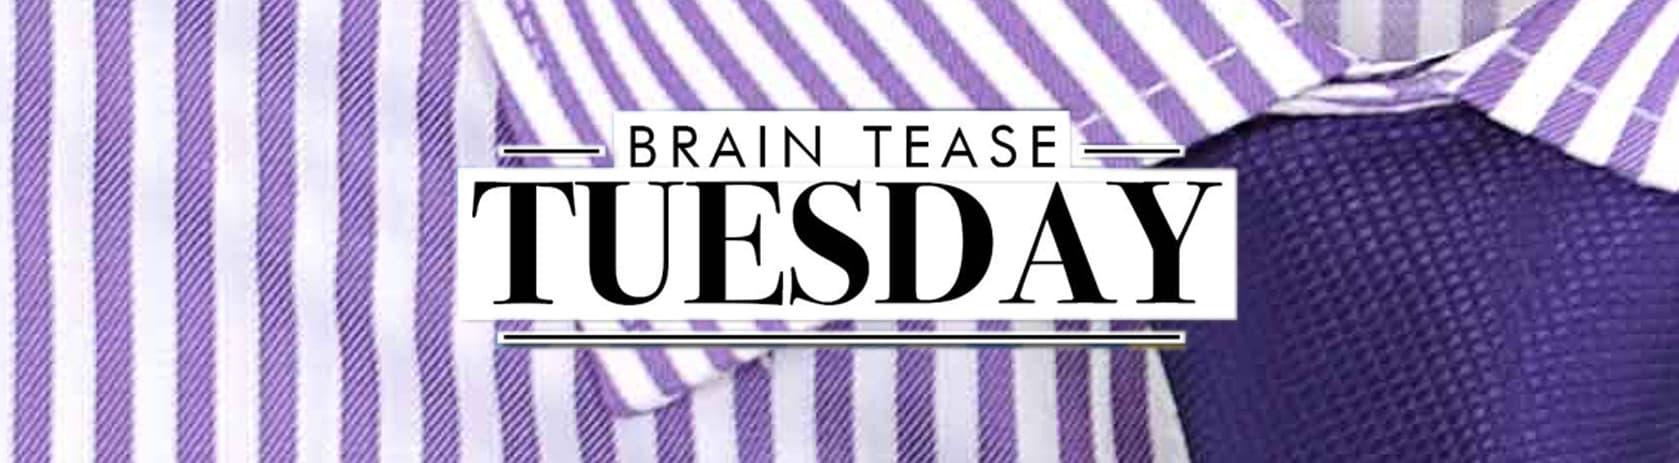 Brain Tease Tuesday Week 29